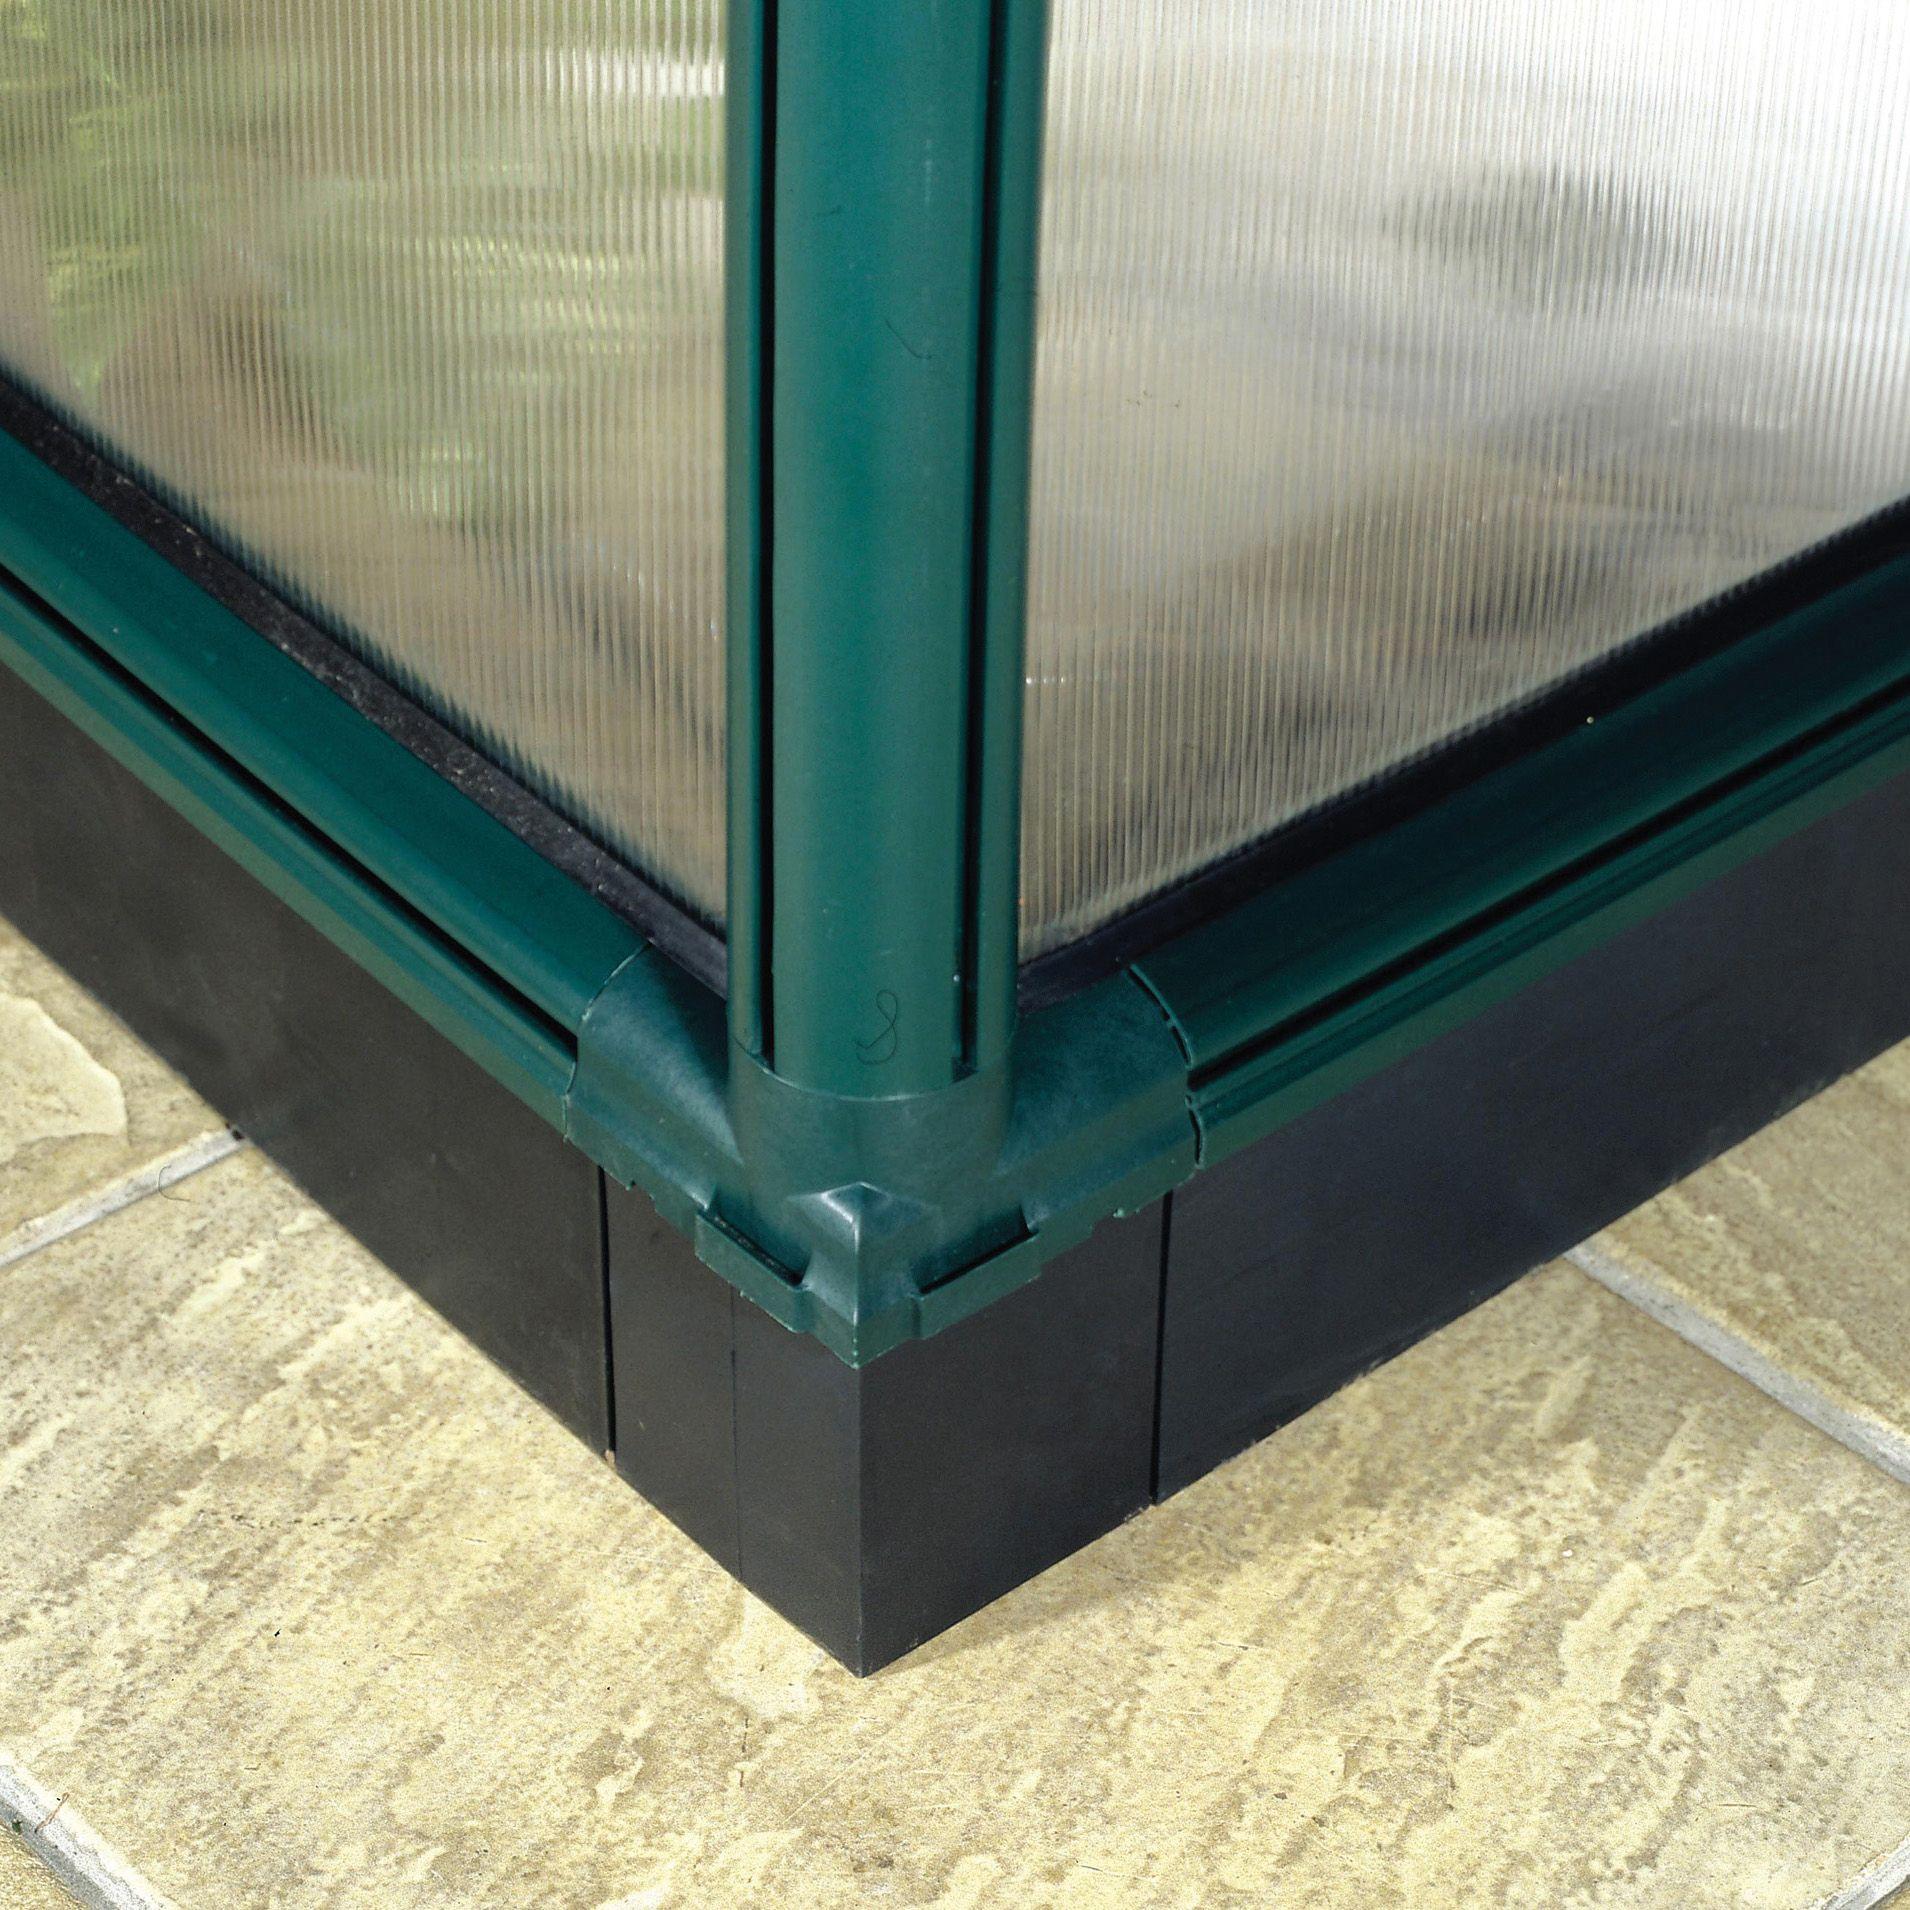 8x8 Greenhouse base